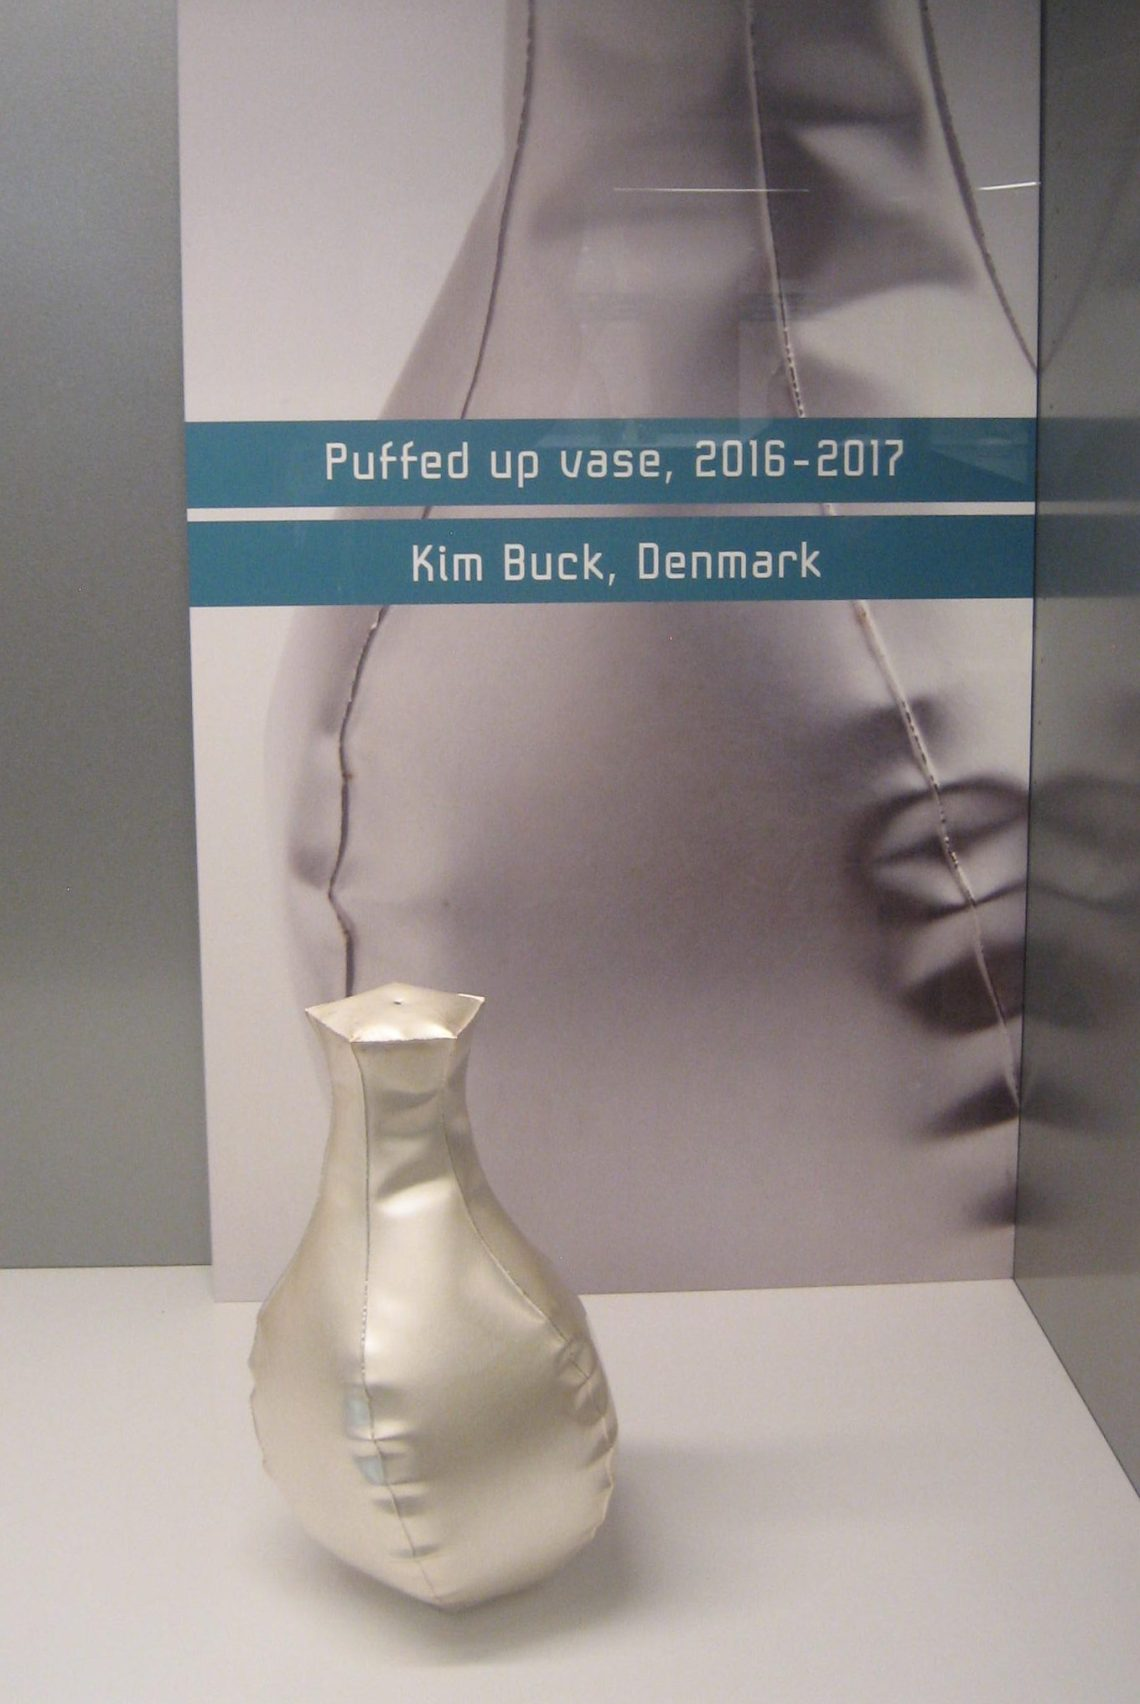 Kim Buck, Puffed up vase, 2016-2017. Foto Esther Doornbusch, 29 maart 2019, CC BY 4.0